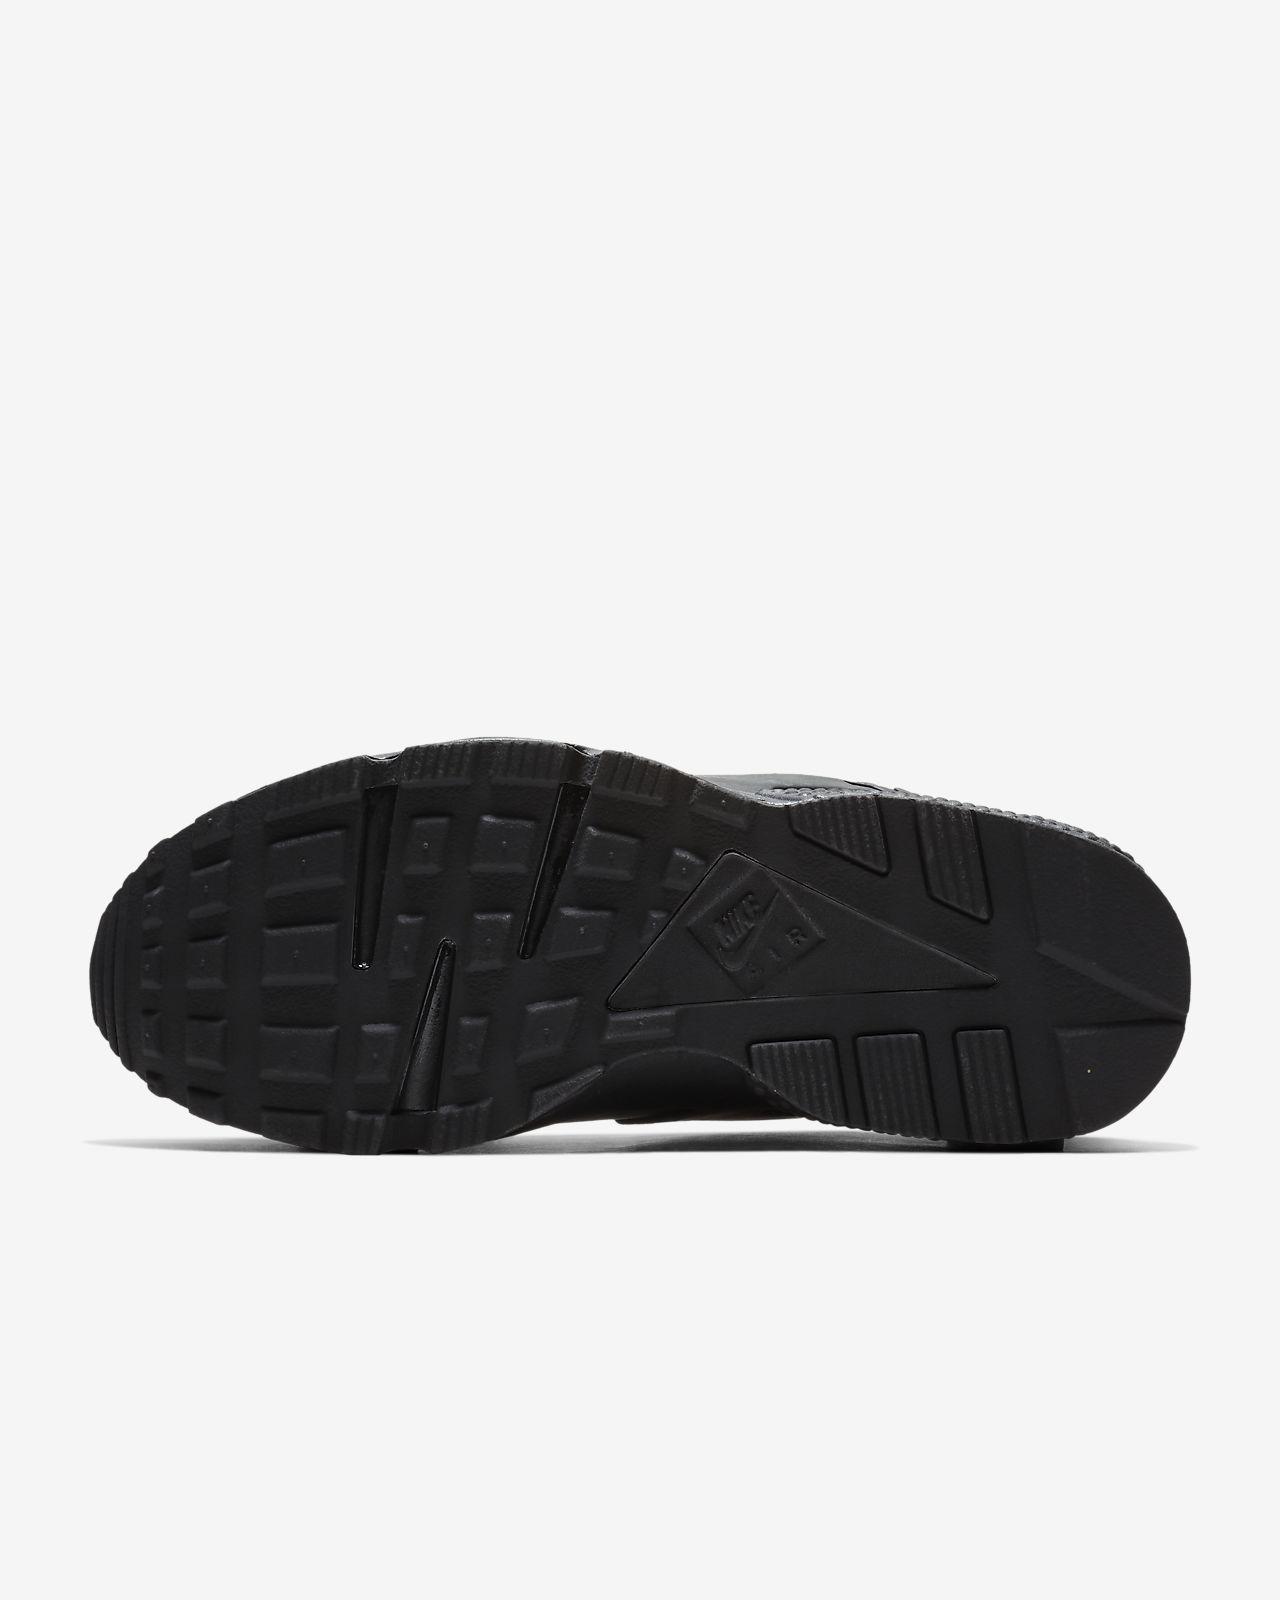 3f58c8834fd5 Calzado para mujer Nike Air Huarache. Nike.com CL